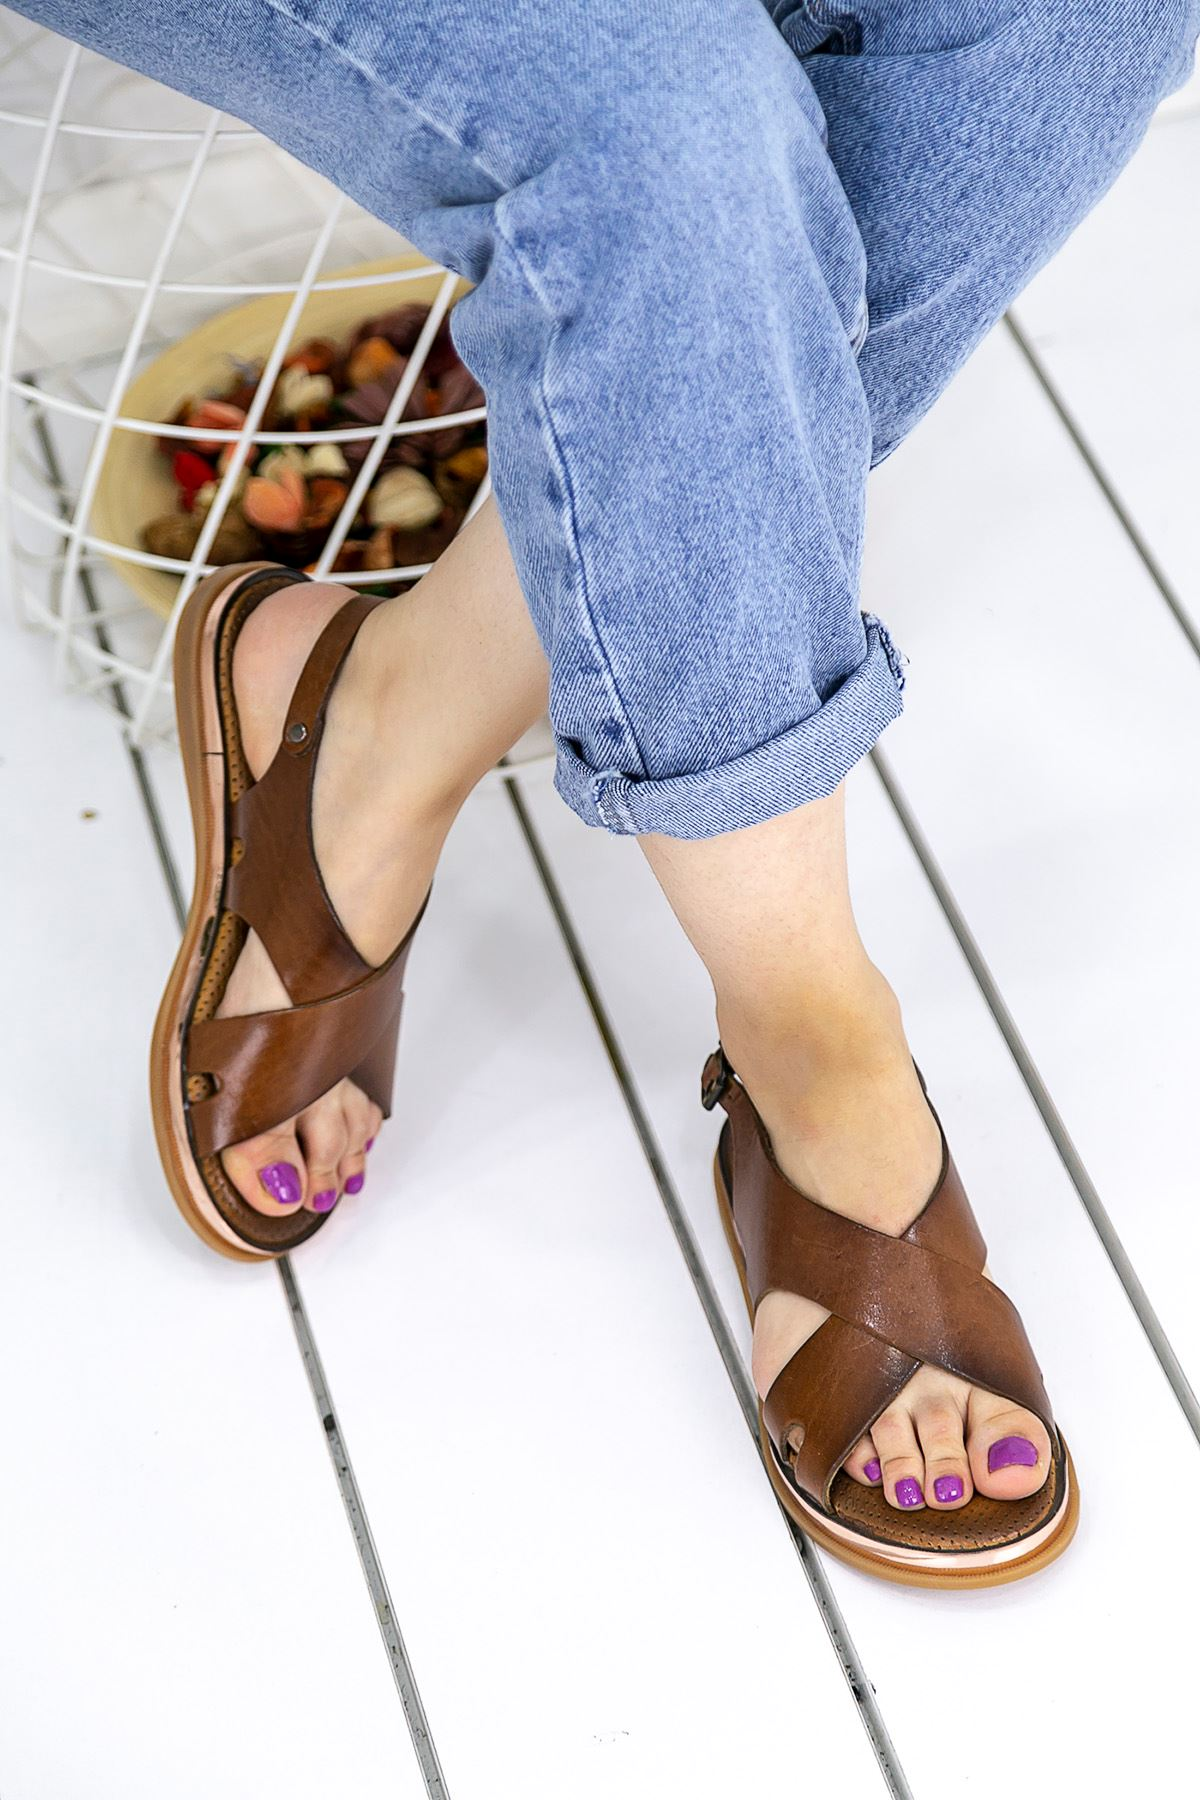 Titan Taba Hakiki Deri Ortapedik Bayan Sandalet